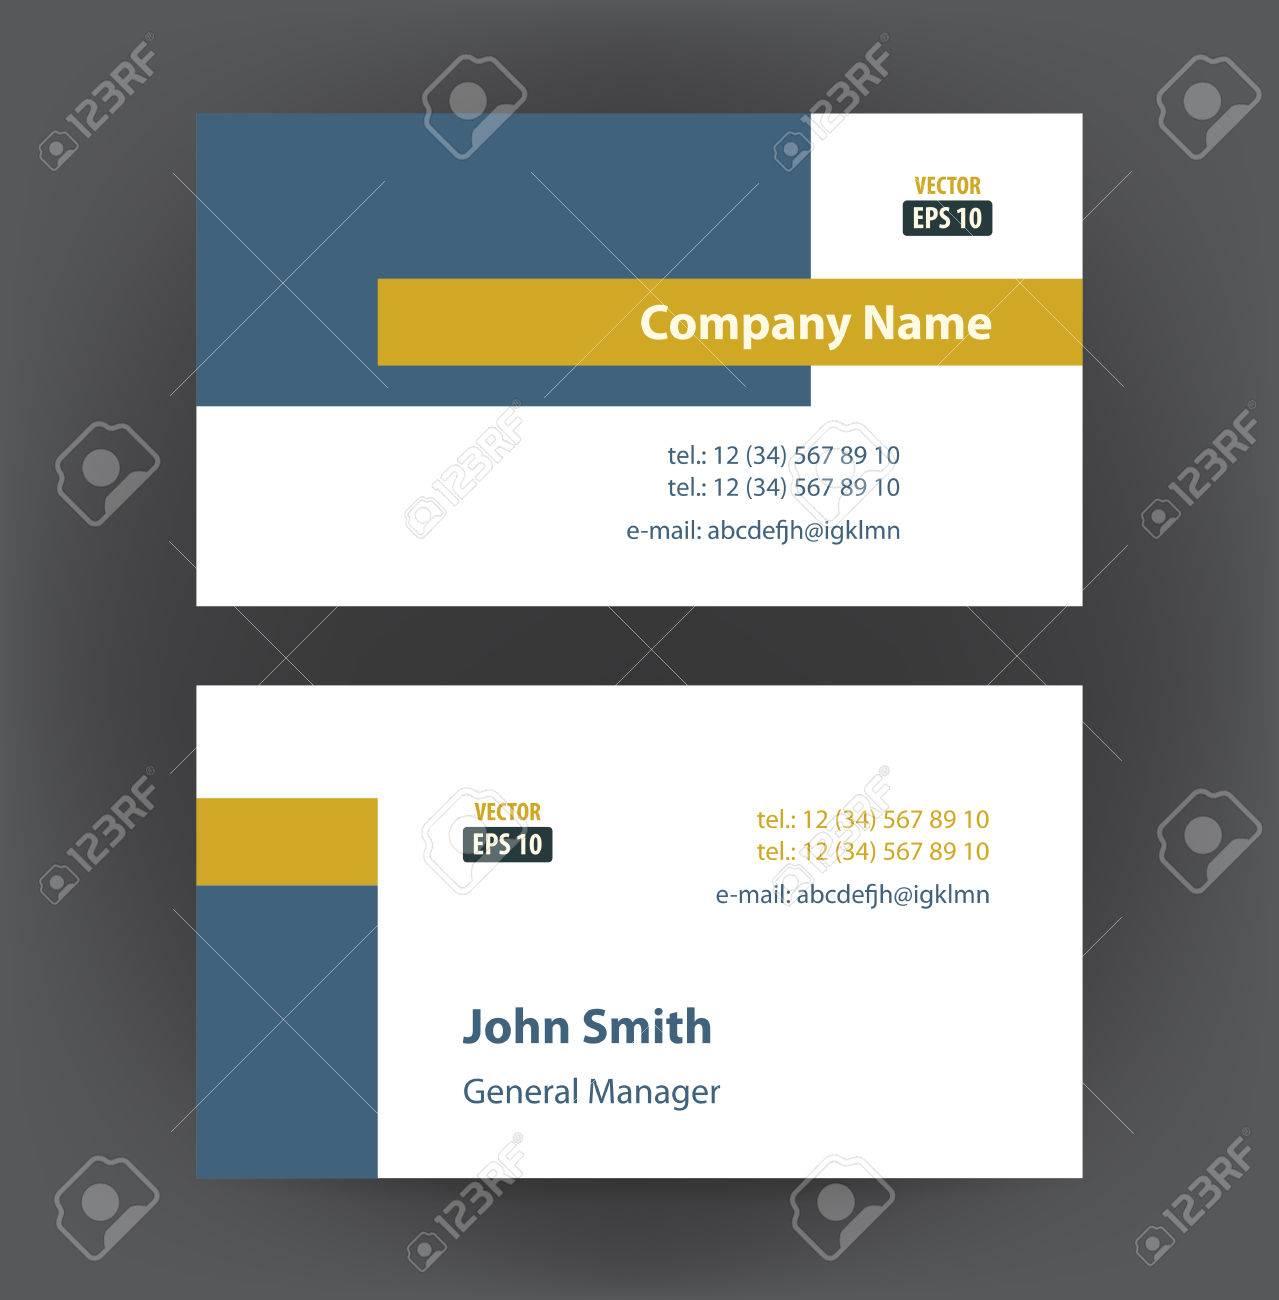 Vector professional designer horizontal personal business cards vector vector professional designer horizontal personal business cards set collection colourmoves